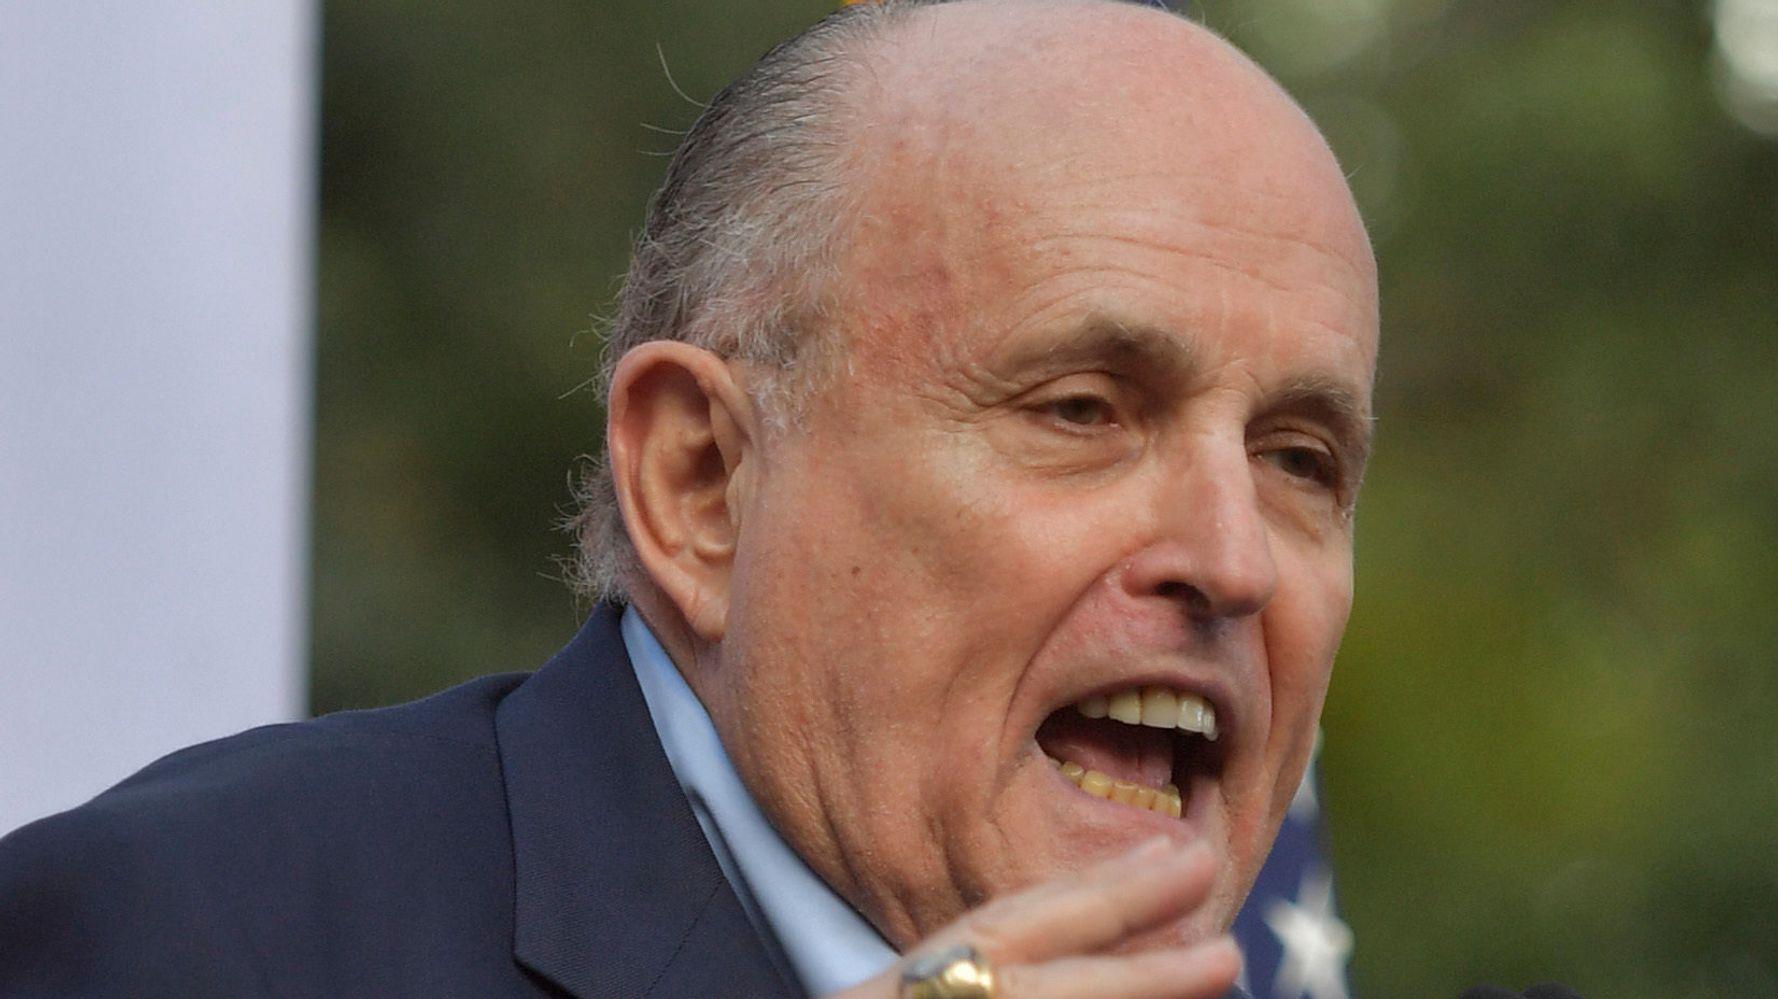 Westlake Legal Group 5e3e523e270000310338b8e2 Watchdog Group Calls For Criminal Probe Into Rudy Giuliani's Ukraine Role